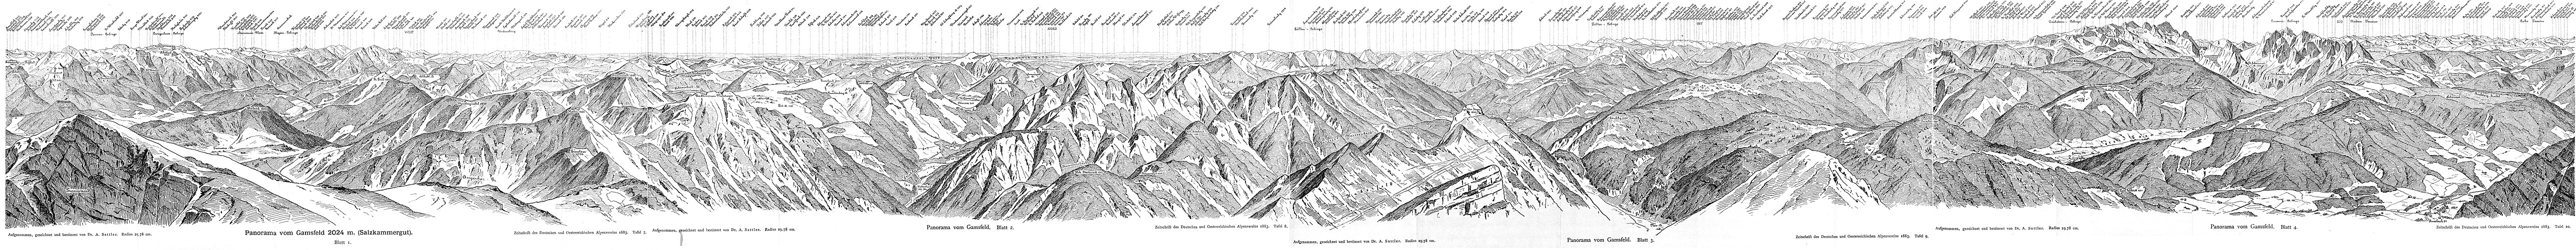 Panorama vom Gamsfeld im Jahr 1883